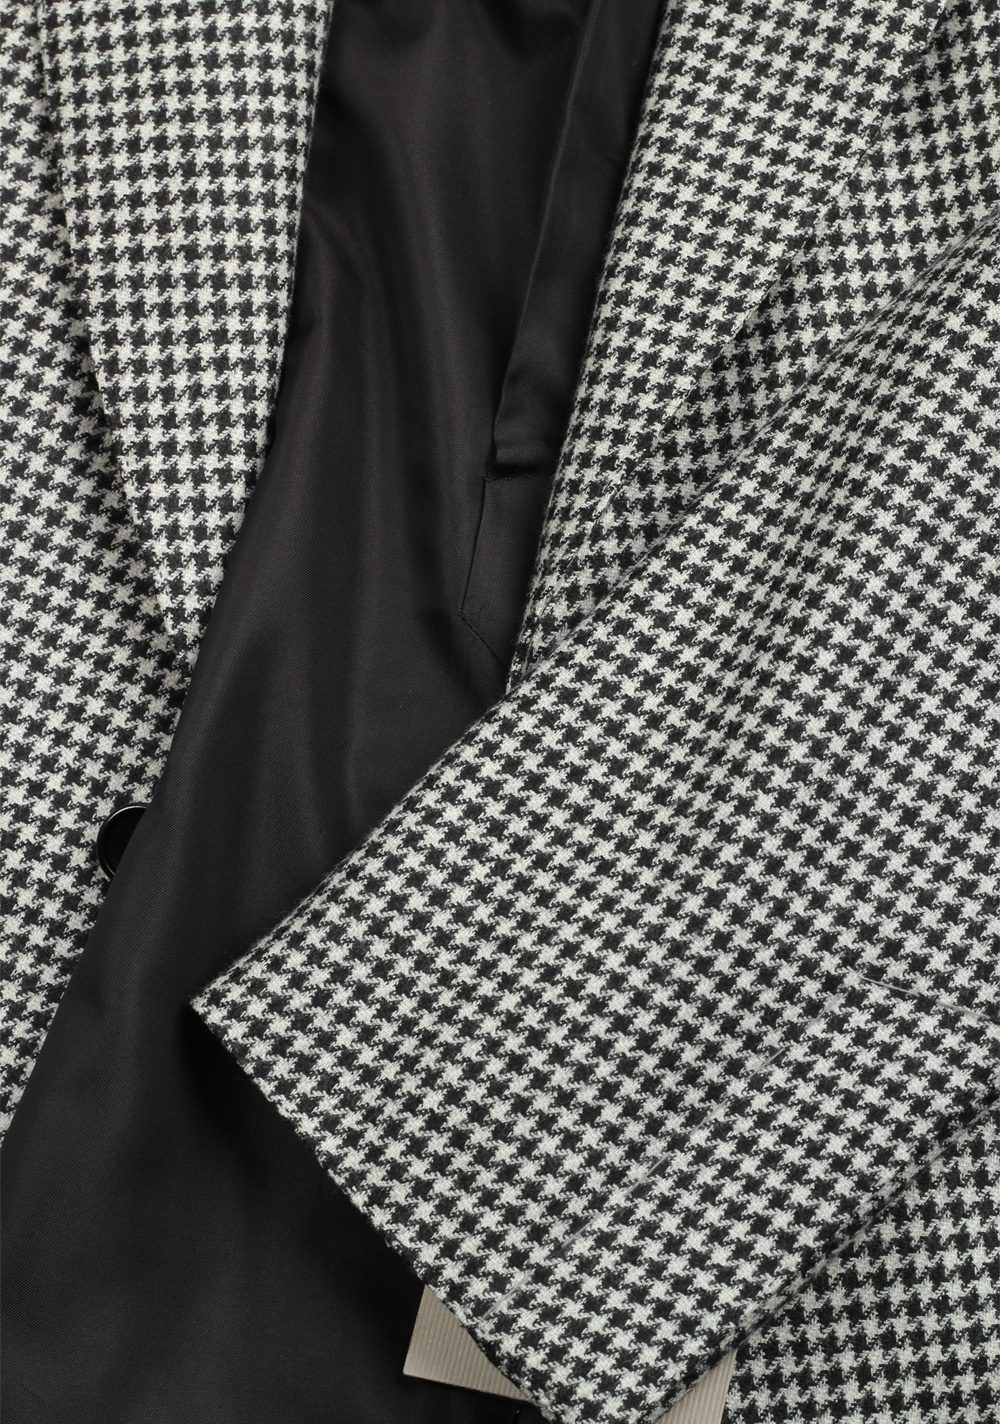 TOM FORD Shelton Houndstooth Black White Suit Size 54 / 44R U.S. | Costume Limité